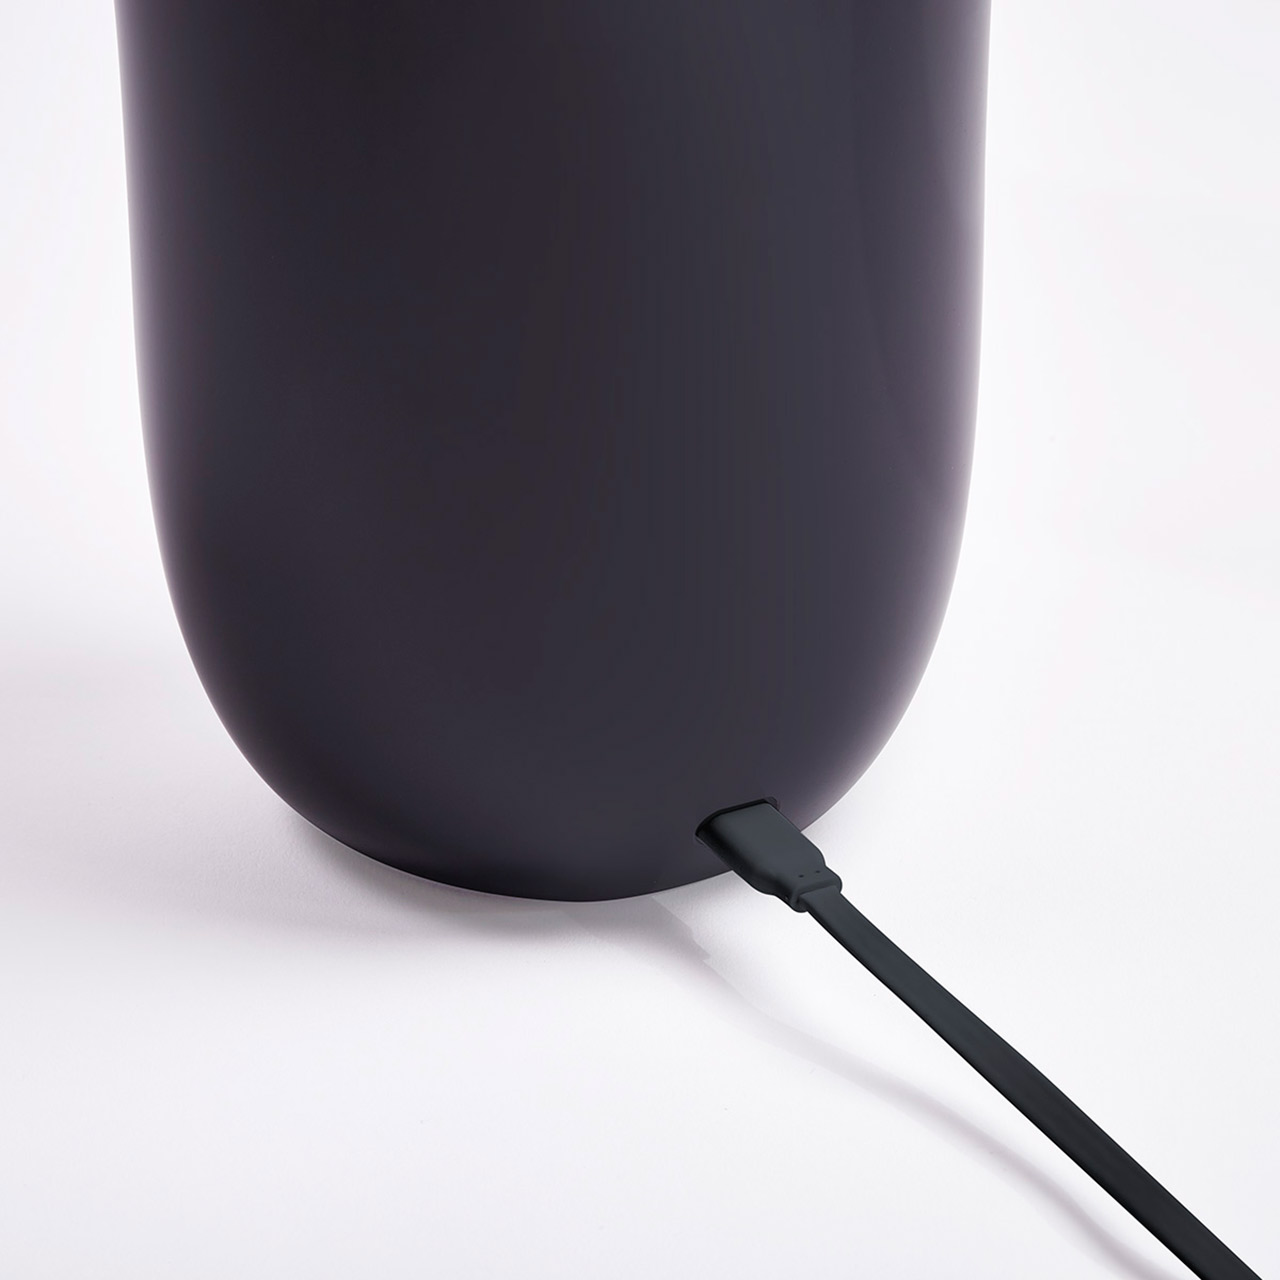 LEXON Oblio UV-C Sanitizing Qi Charging Station Black | The Design Gift Shop